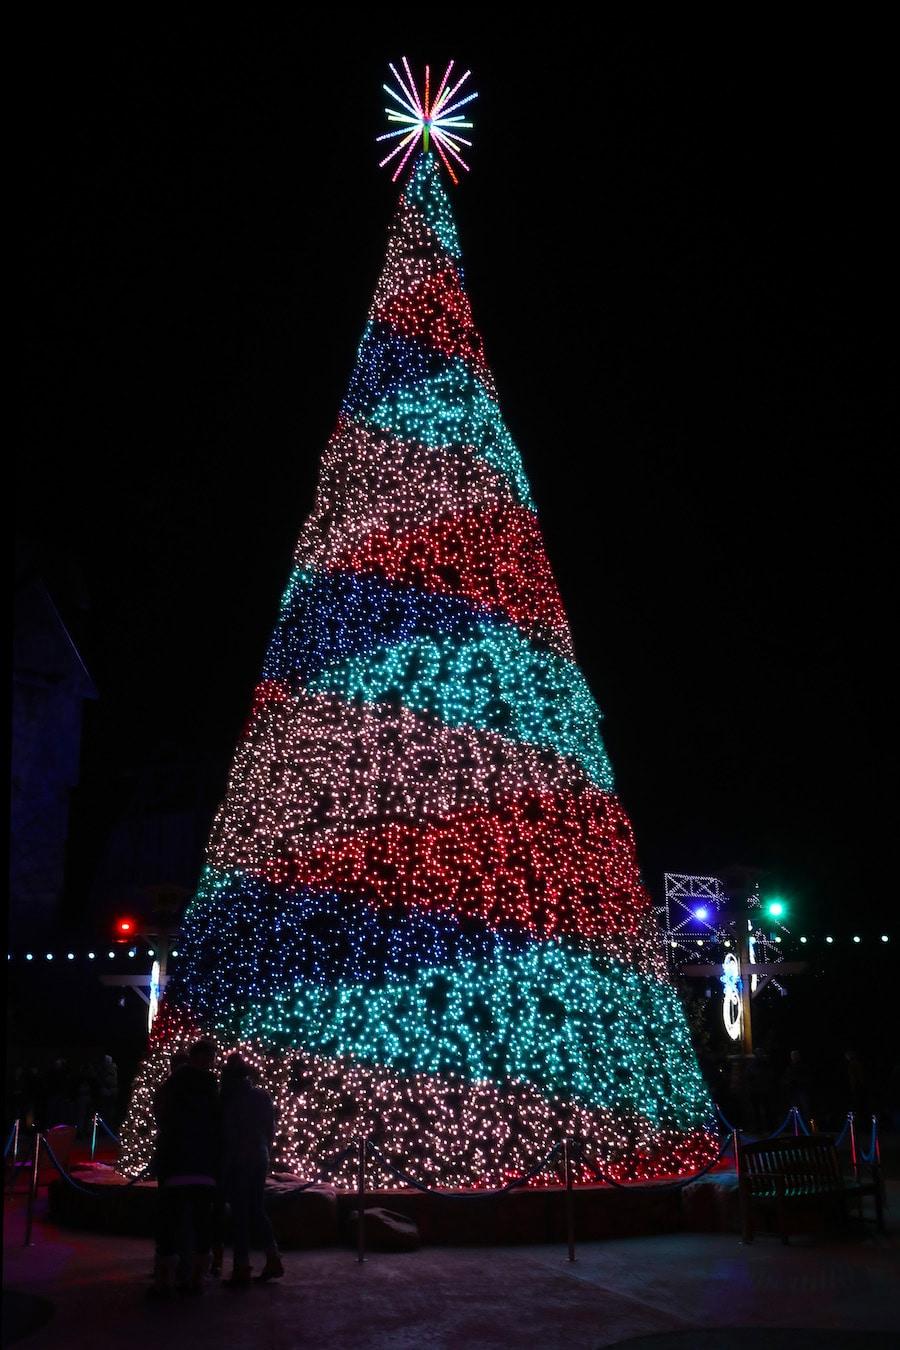 Smoky_Mountain_Christmas_CH_3492_edited